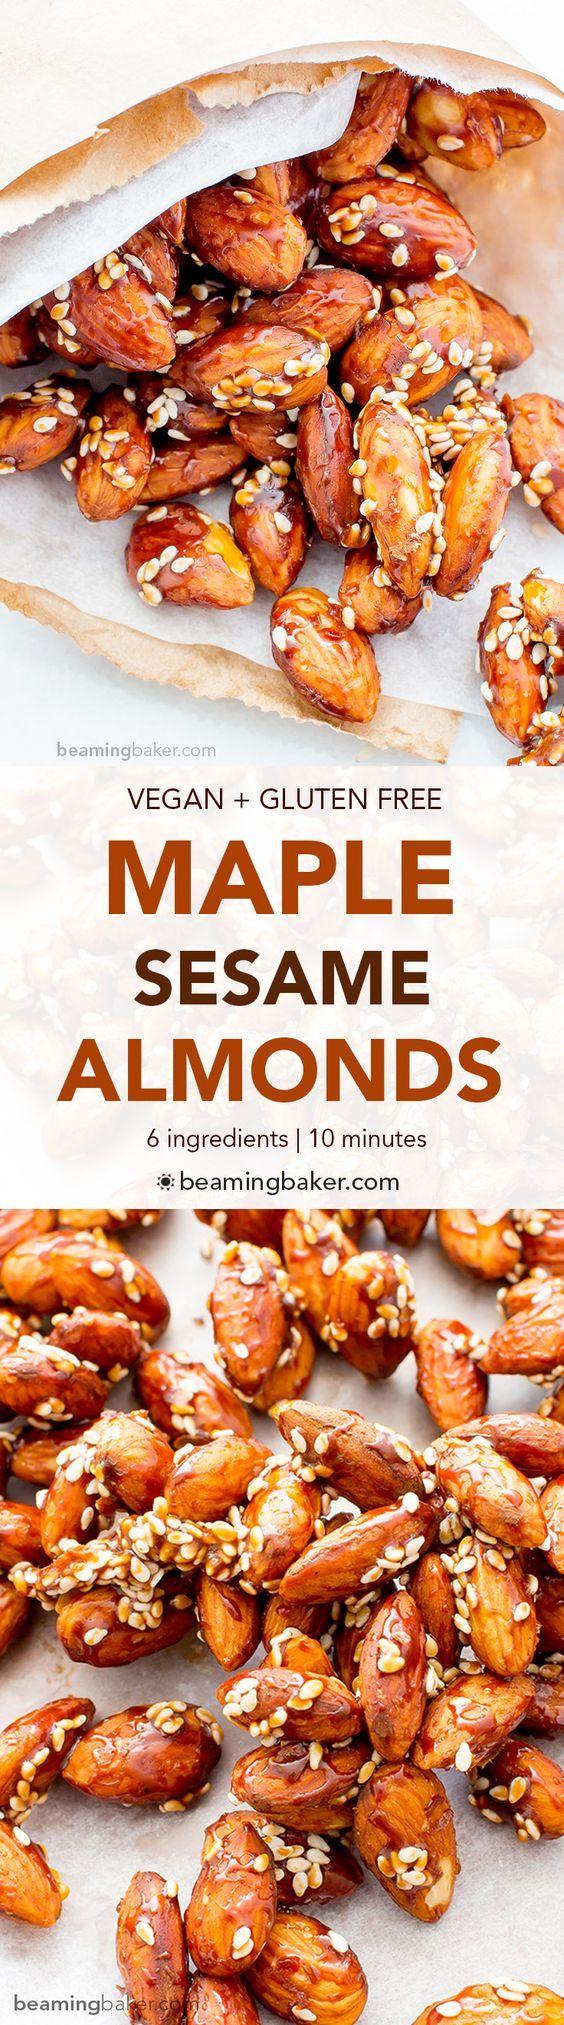 awesome Maple Sesame Almonds (Vegan, Gluten Free)